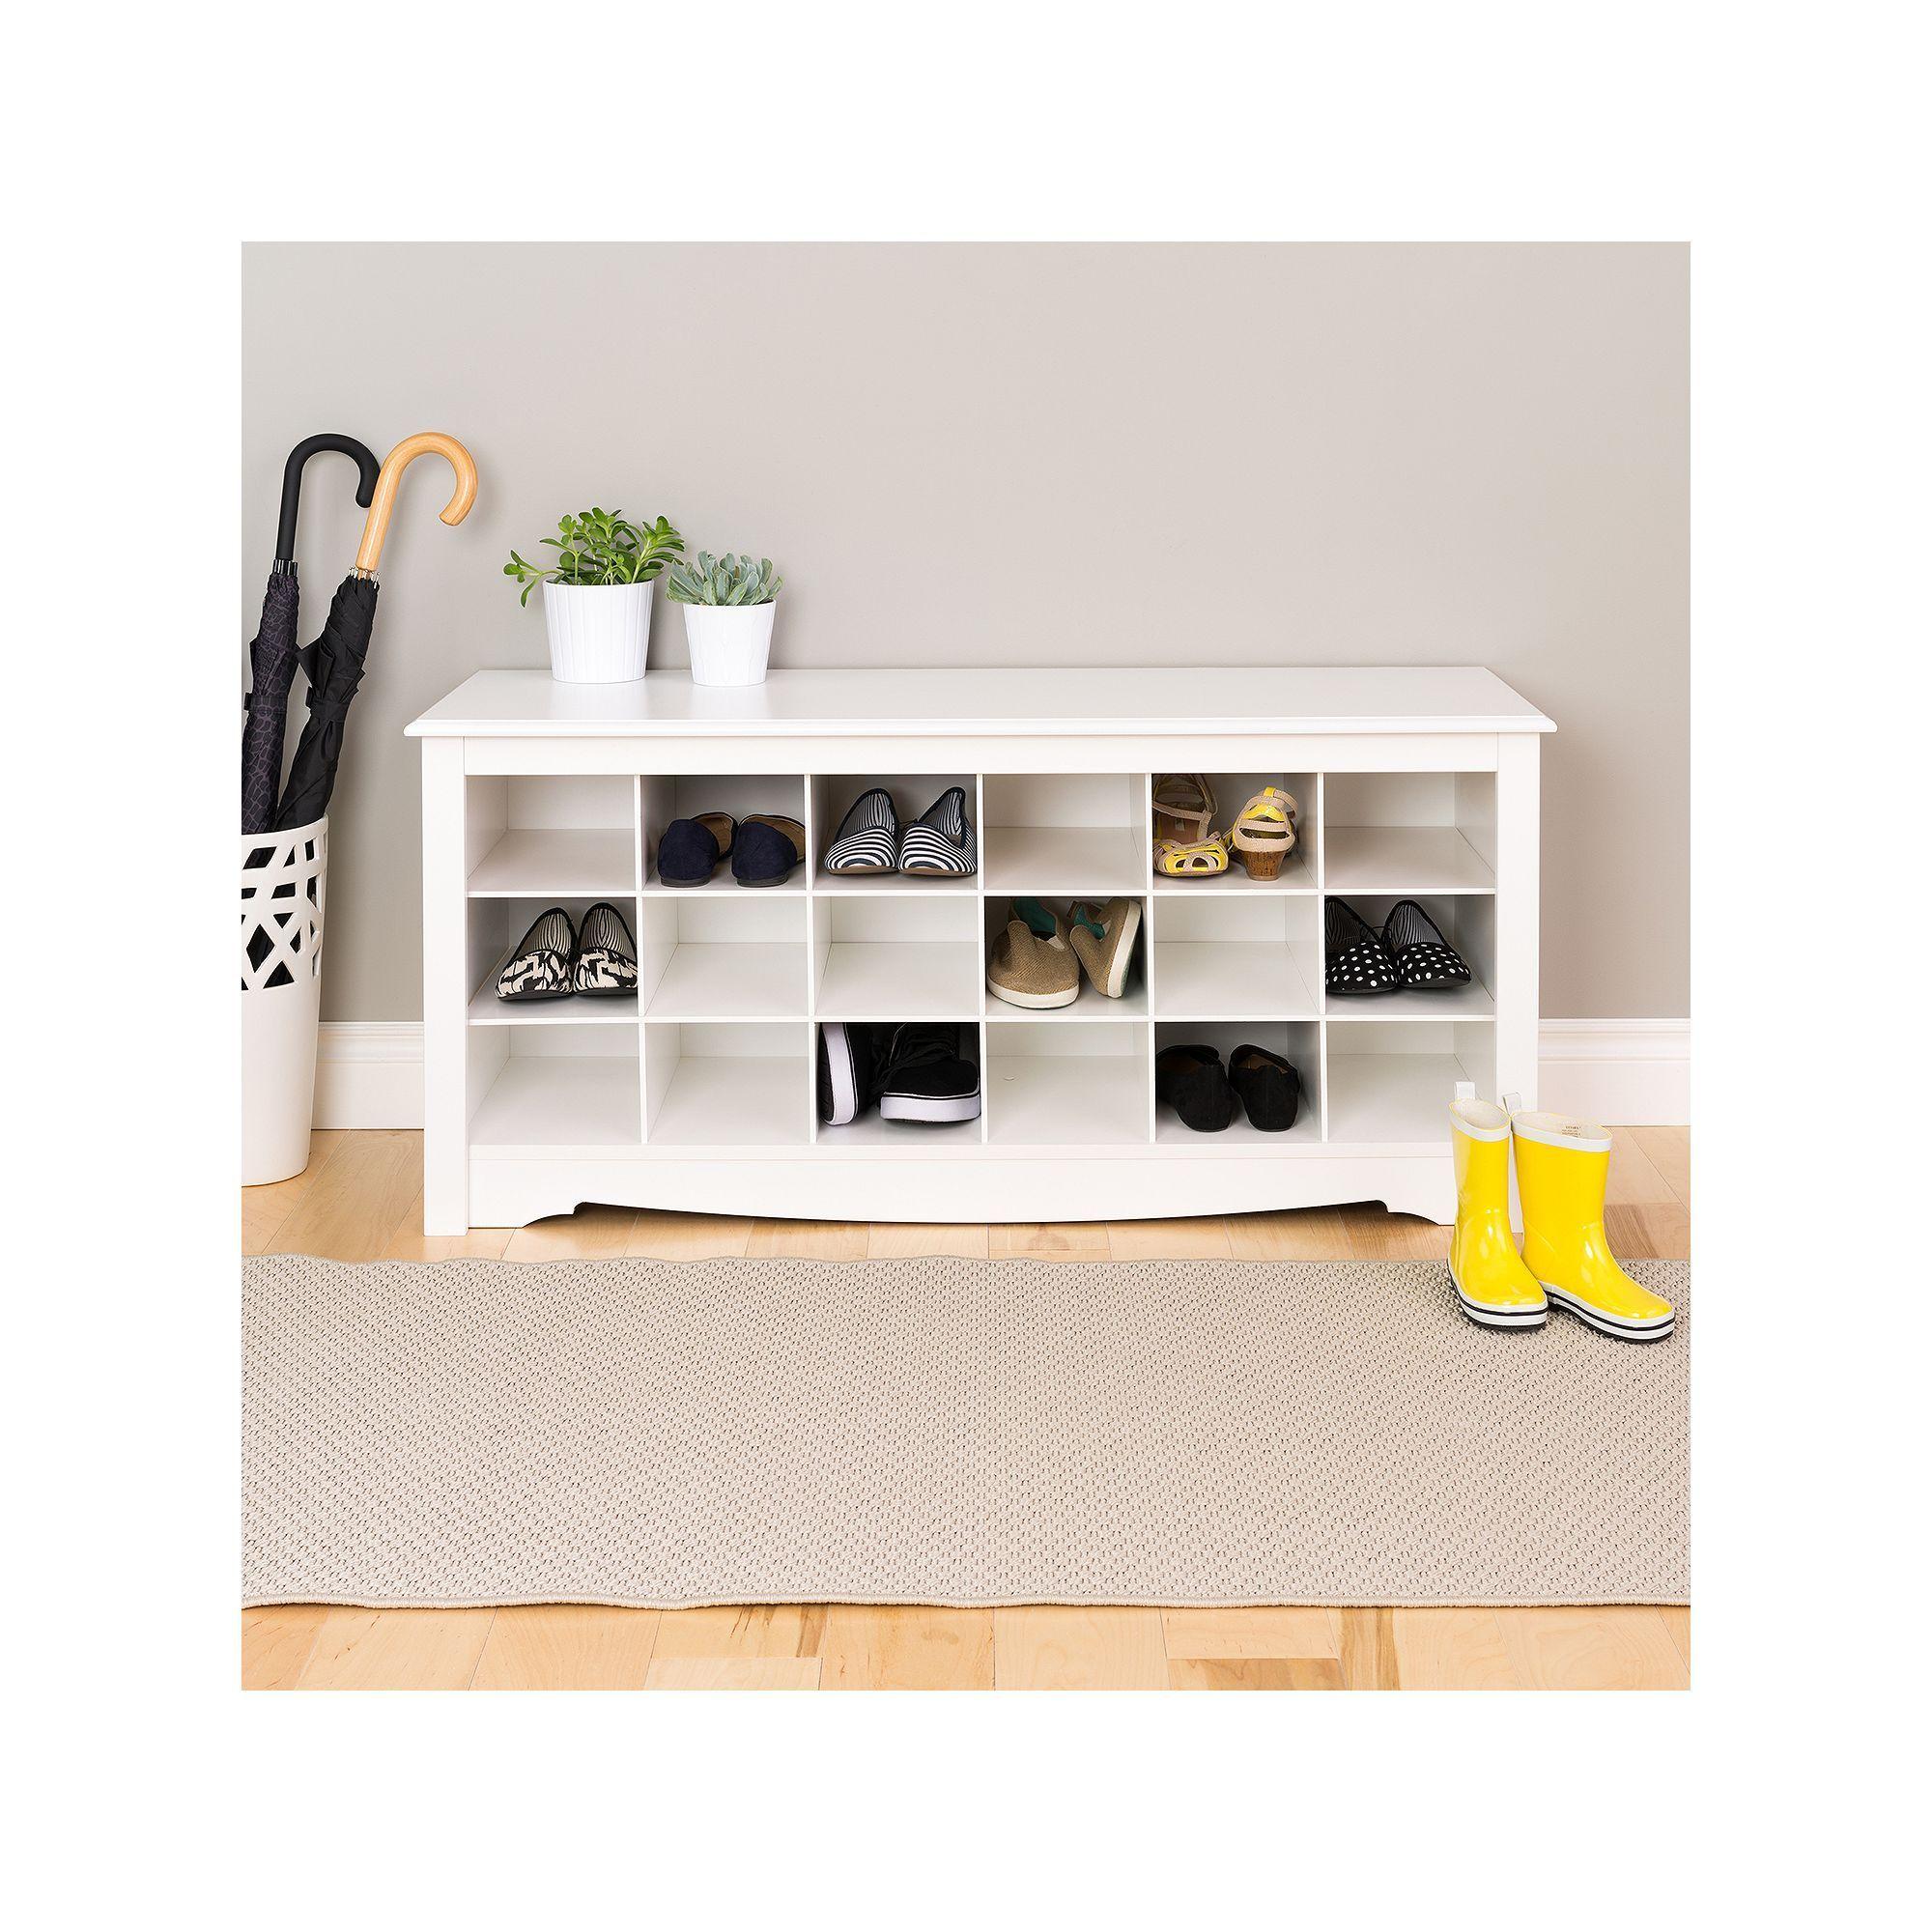 Prepac Shoe Storage Cubby Bench White